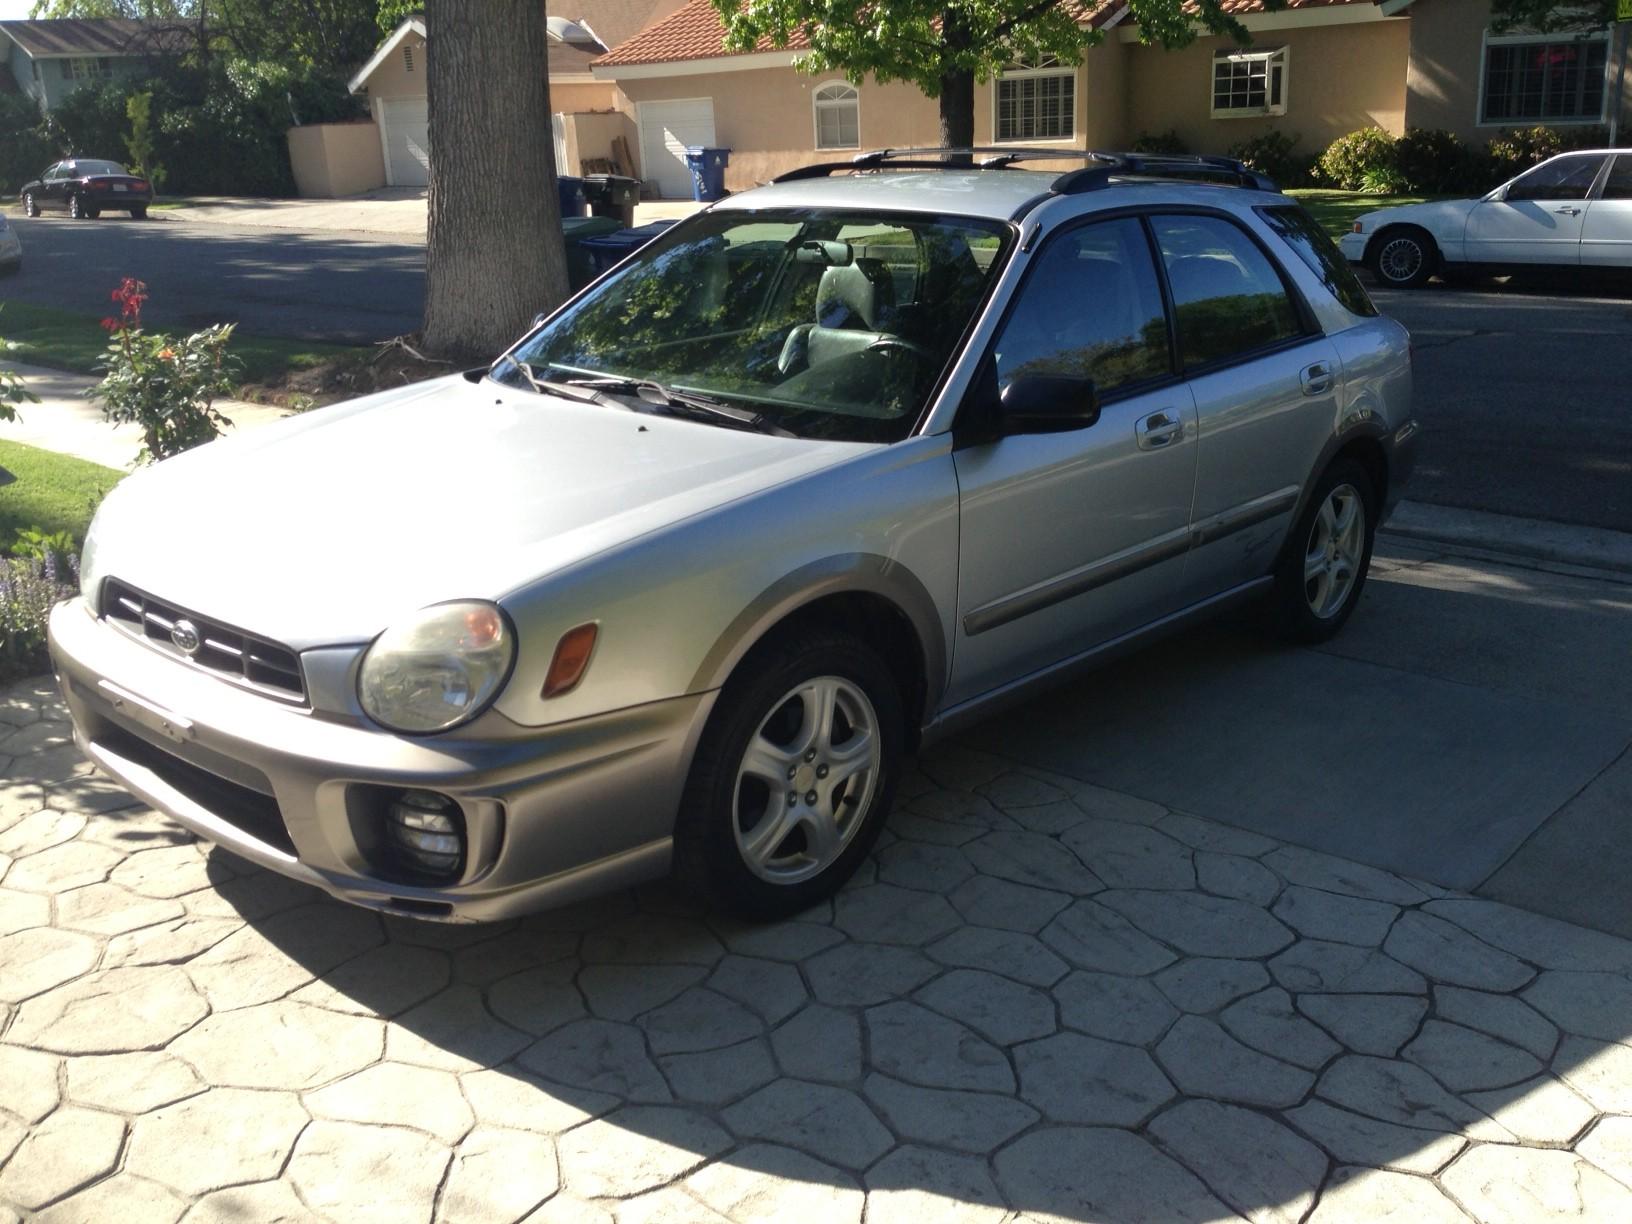 FOR SALE: 2002 Subaru Impreza -  Outback Sport AWD-subaru2.jpg